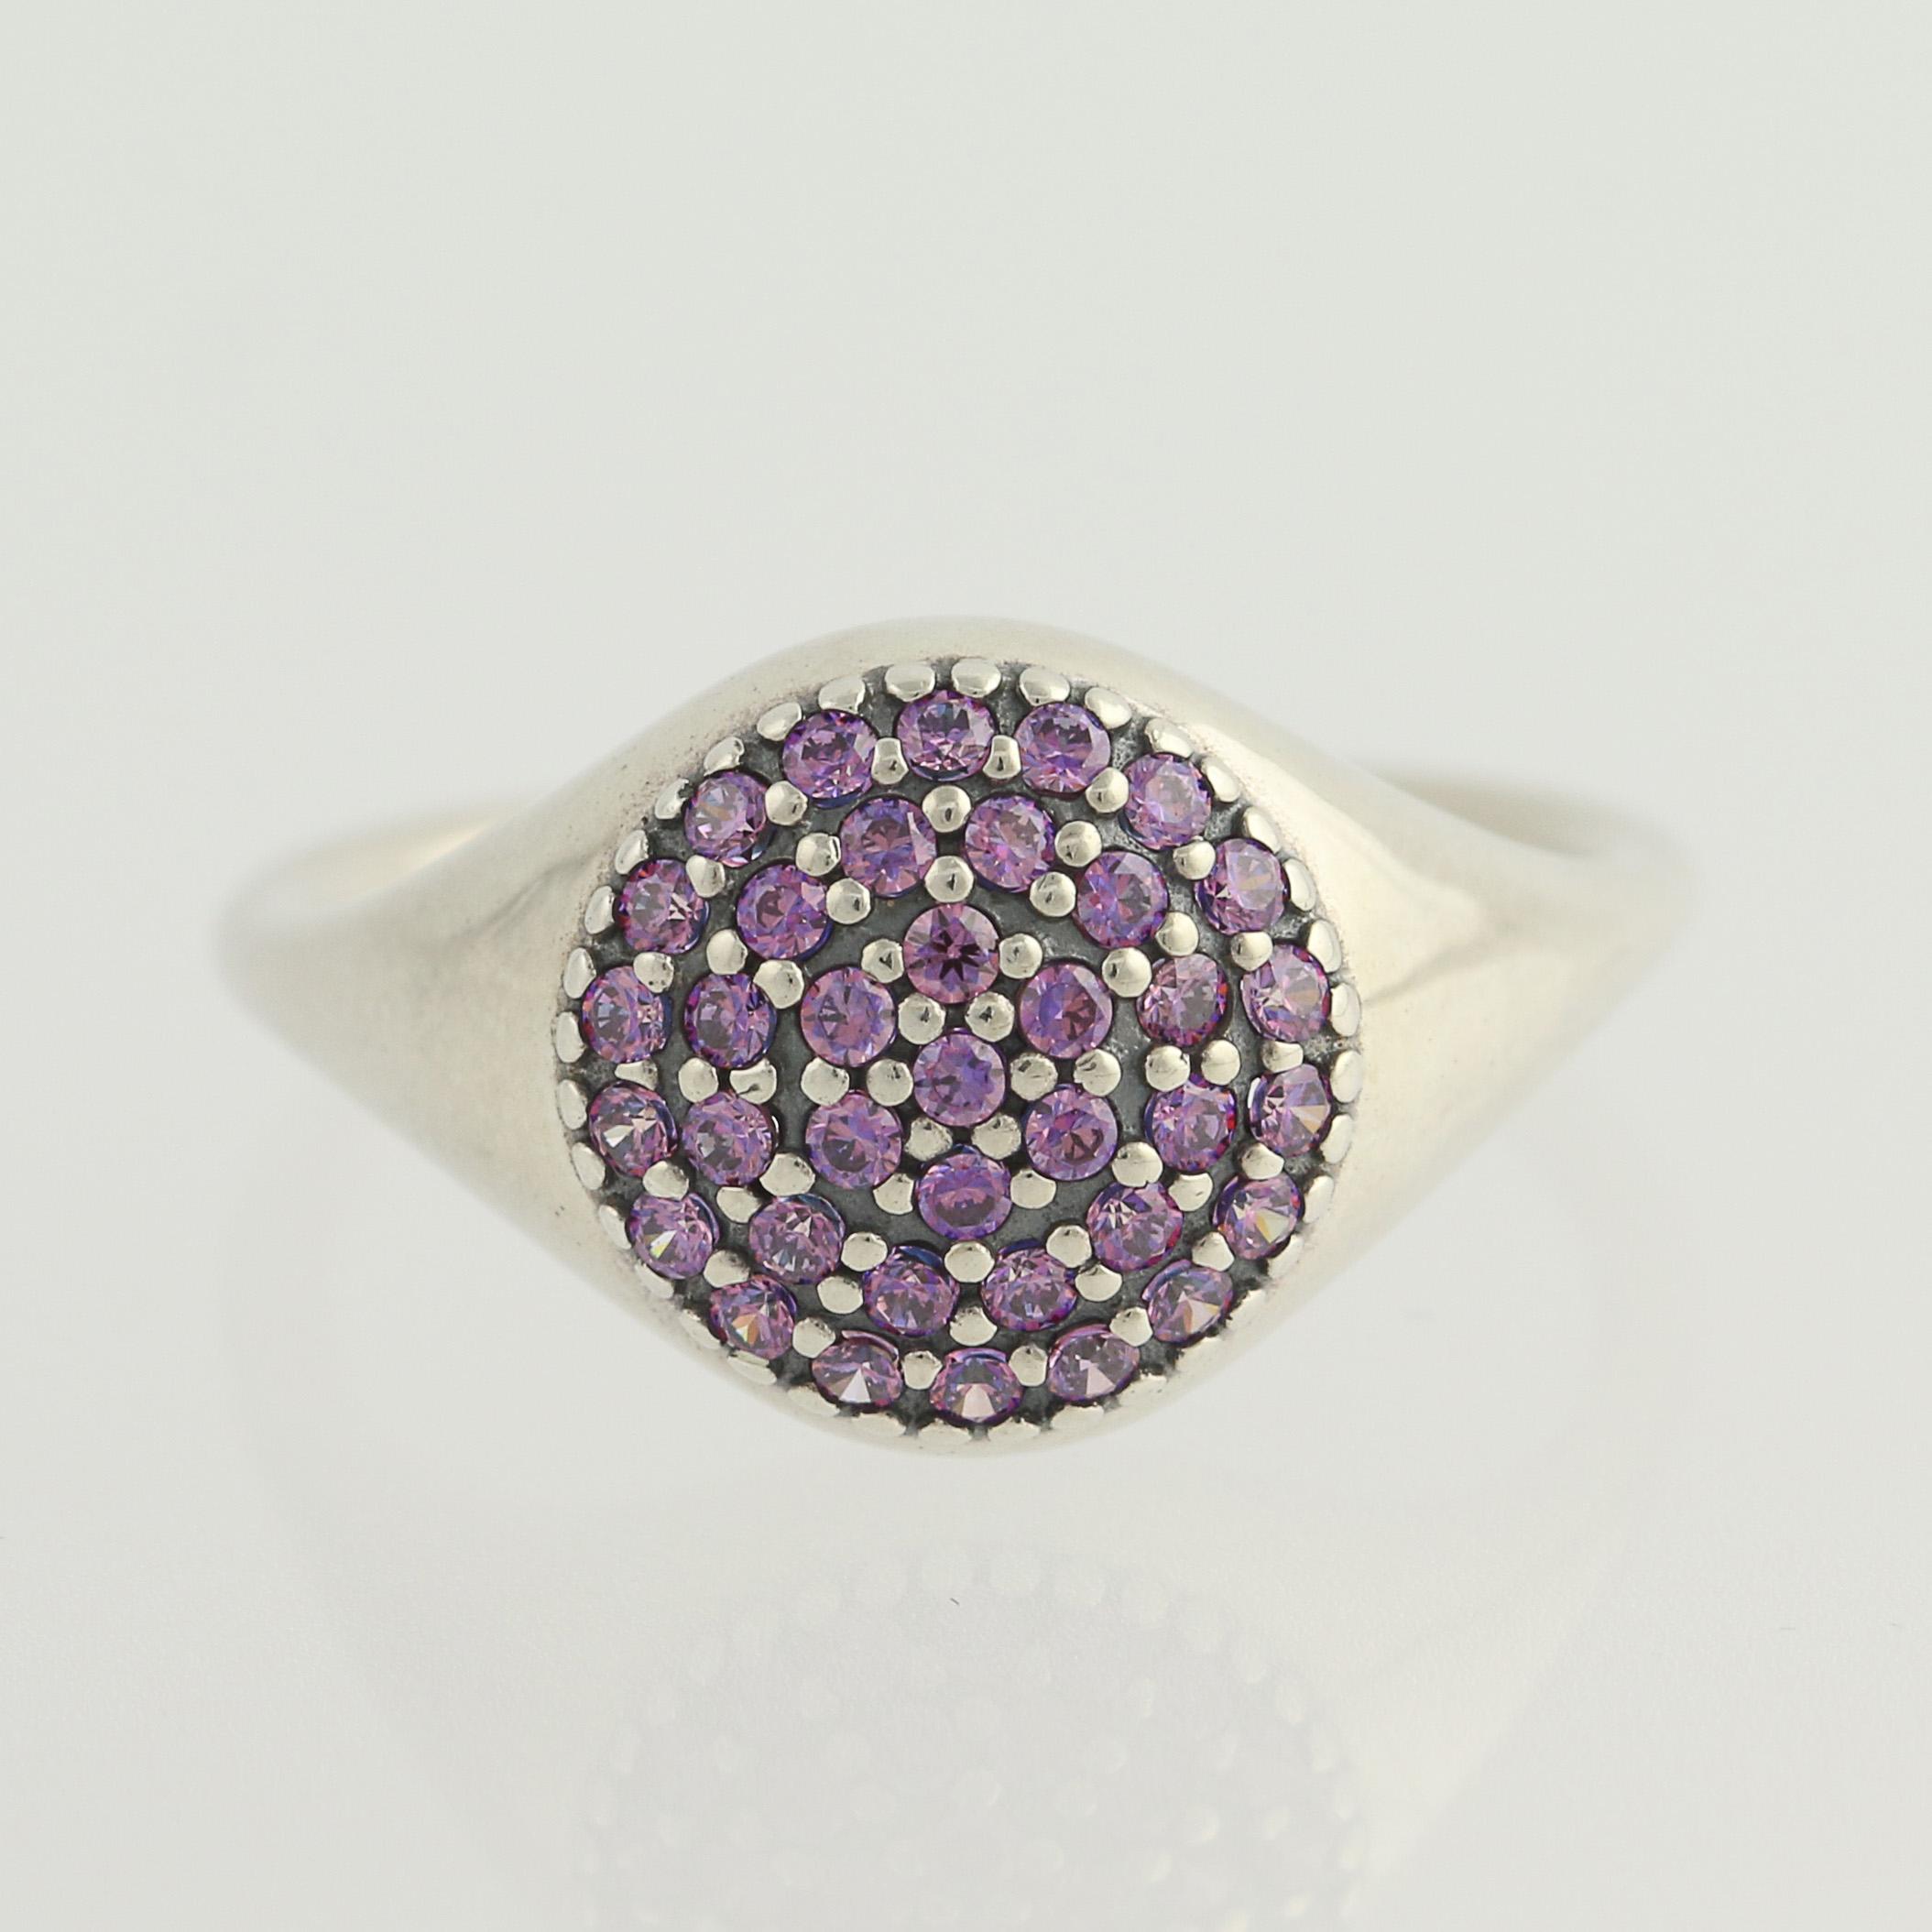 c64da5c26 New Pandora Ring - 190888CFP Large Pave Purple CZ Sterling Silver 7 ...